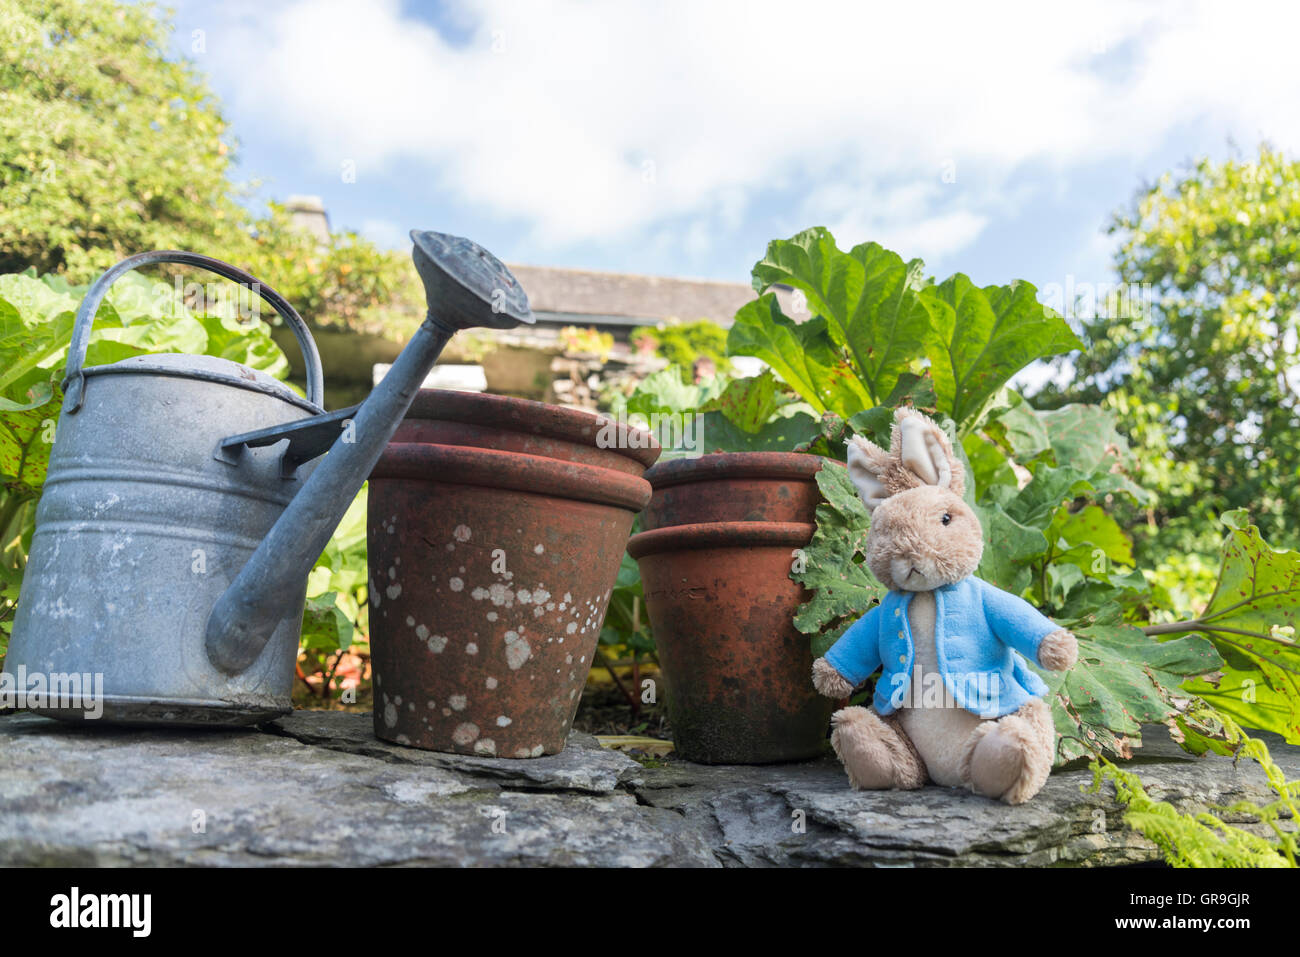 Hill Top, home of Beatrix Potter, creator of Peter Rabbit. Lake District, Cumbria, UK - Stock Image